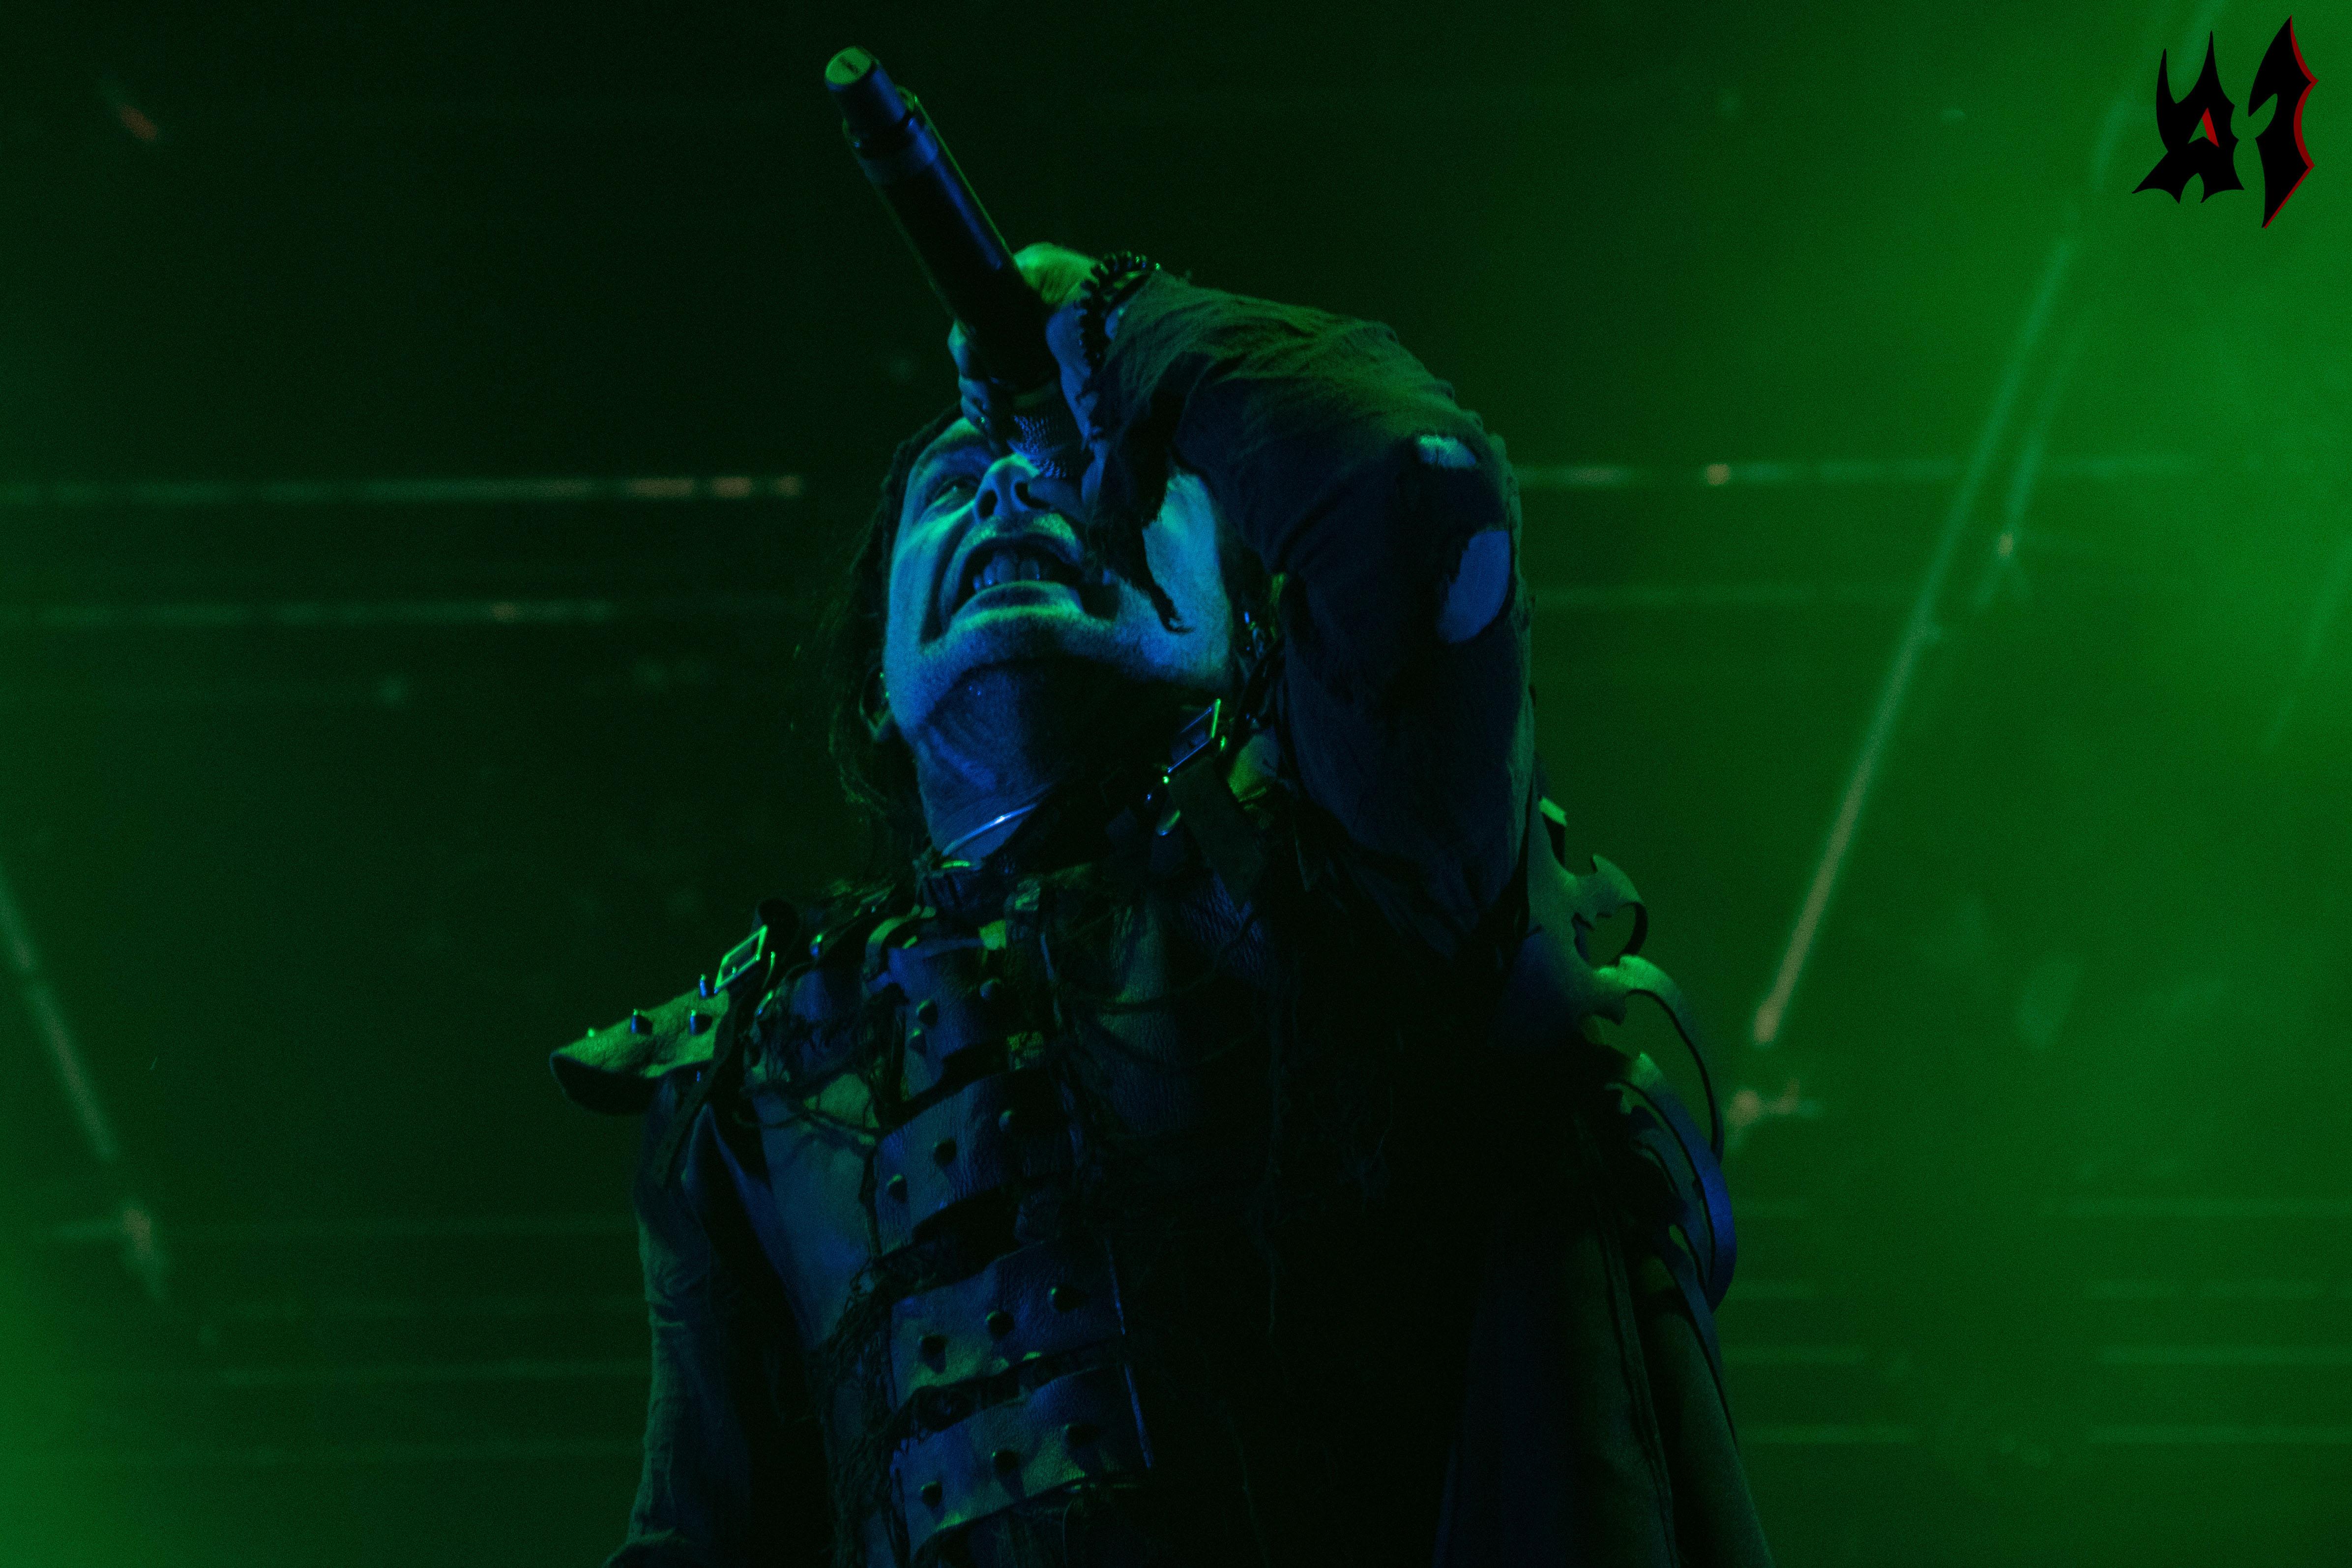 Hellfest - Cradle Of Filth - 23